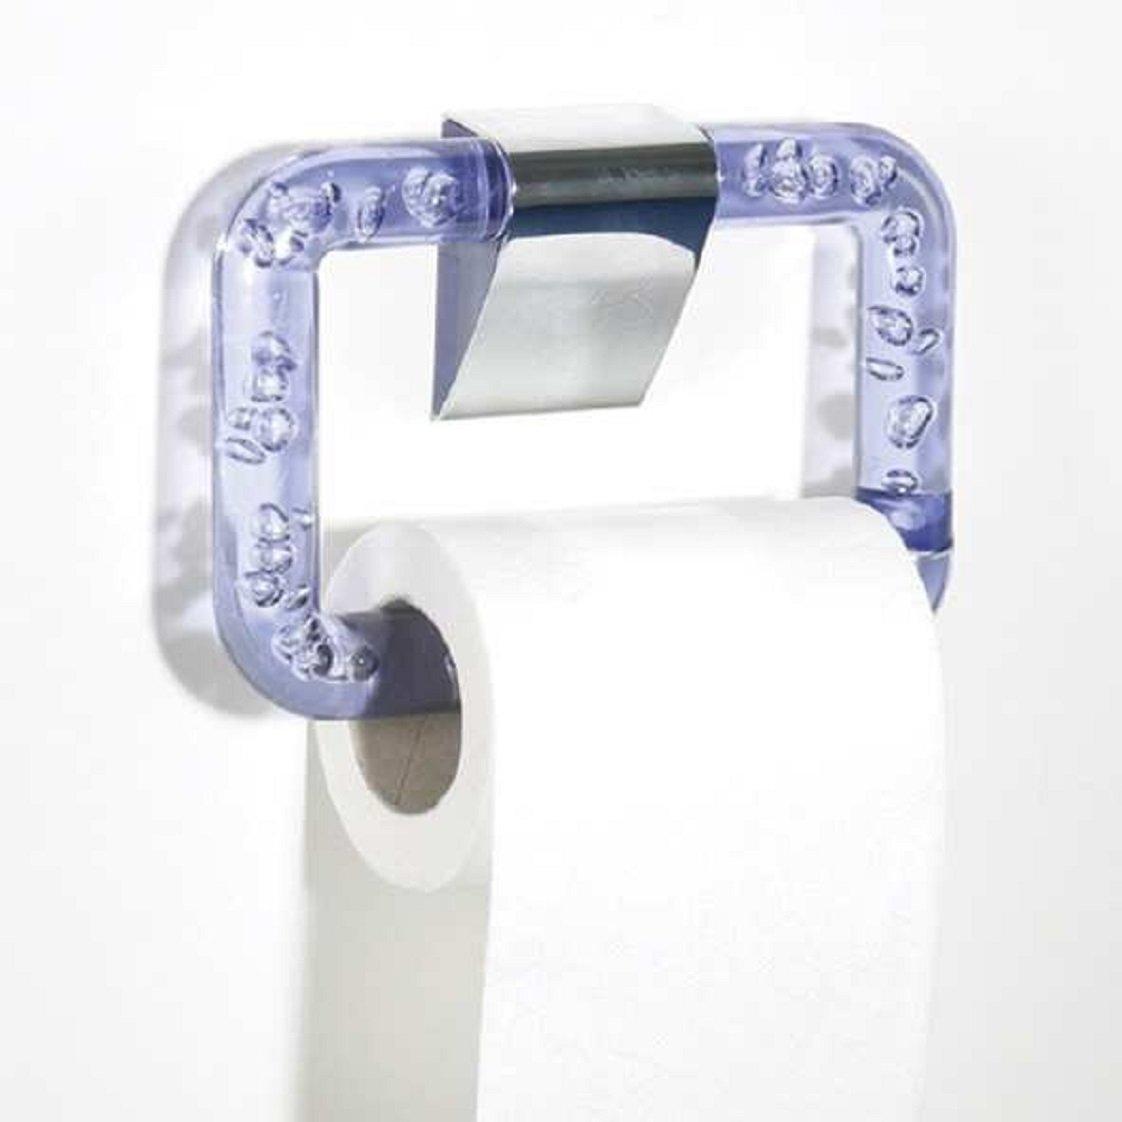 Papierhalter Rollenhalter Toilettenpapier Klopapierhalter WC Bad Lila Blau